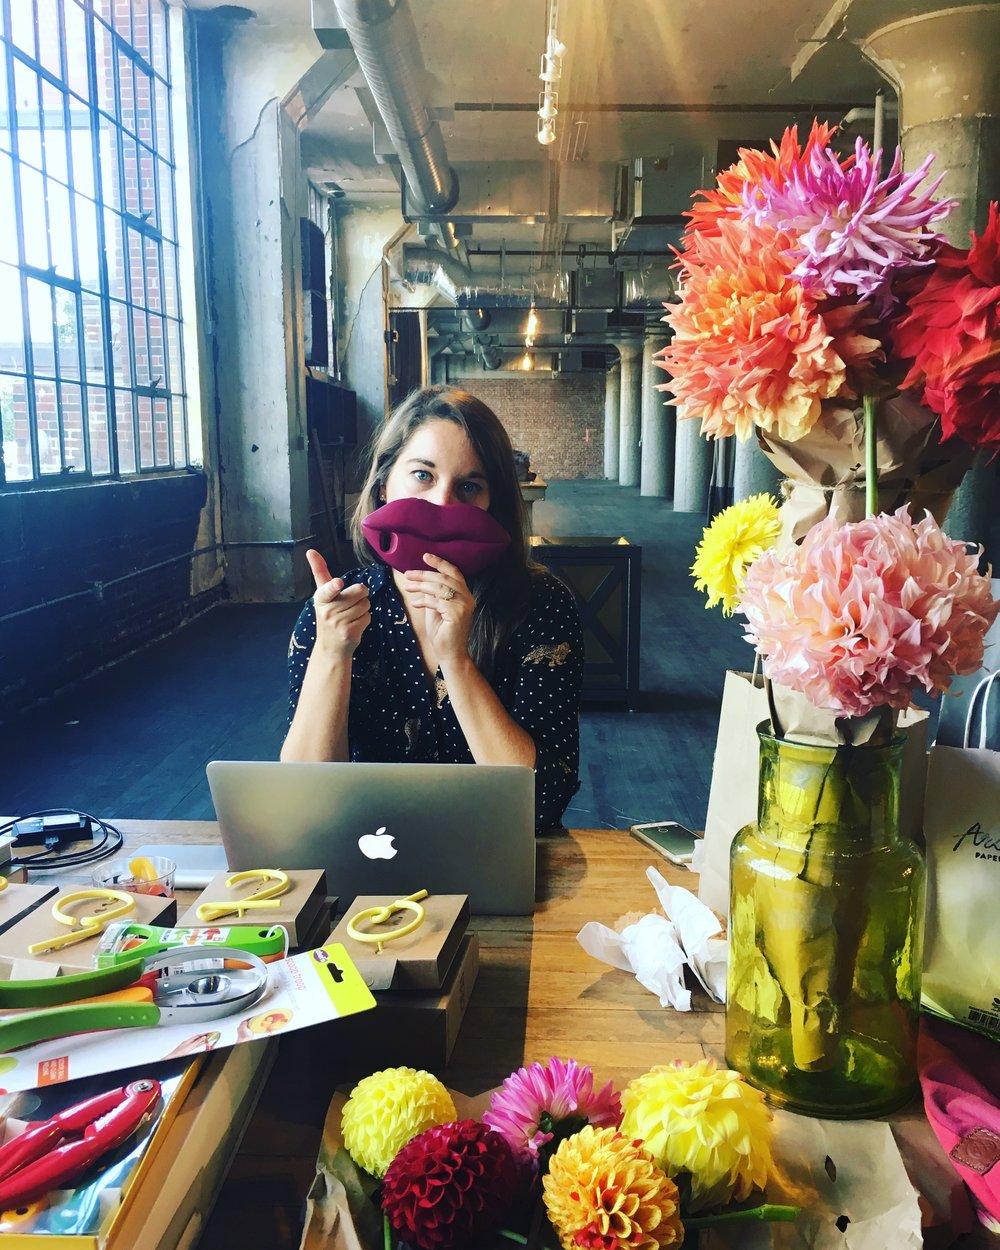 Caroline cheesing among floral props, editing photos.